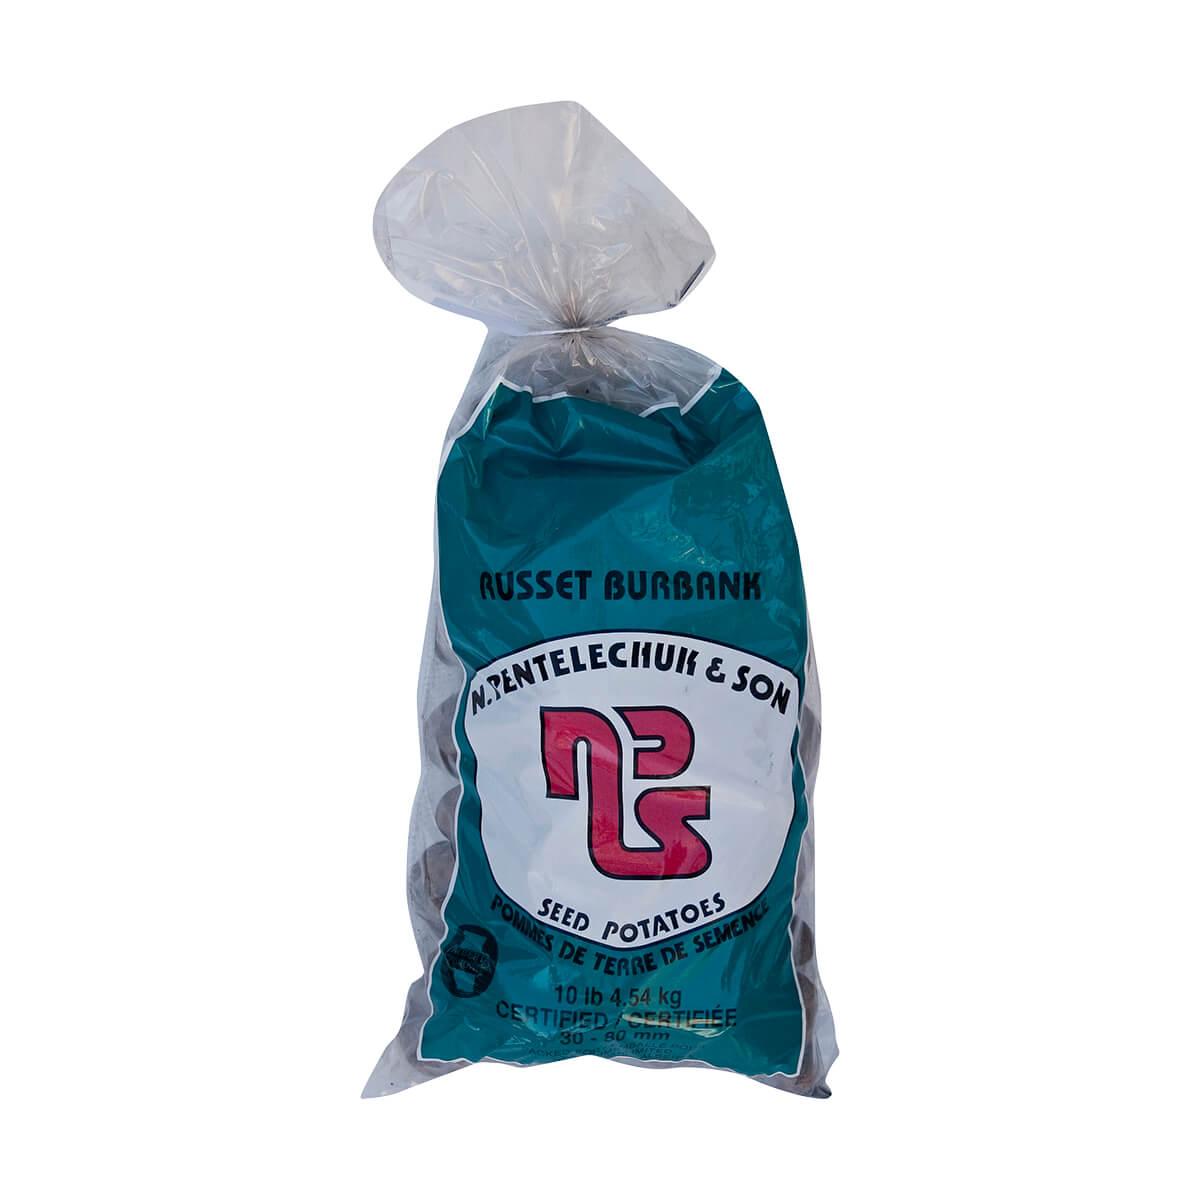 Russet Burbank Seed Potatoes - 5lb